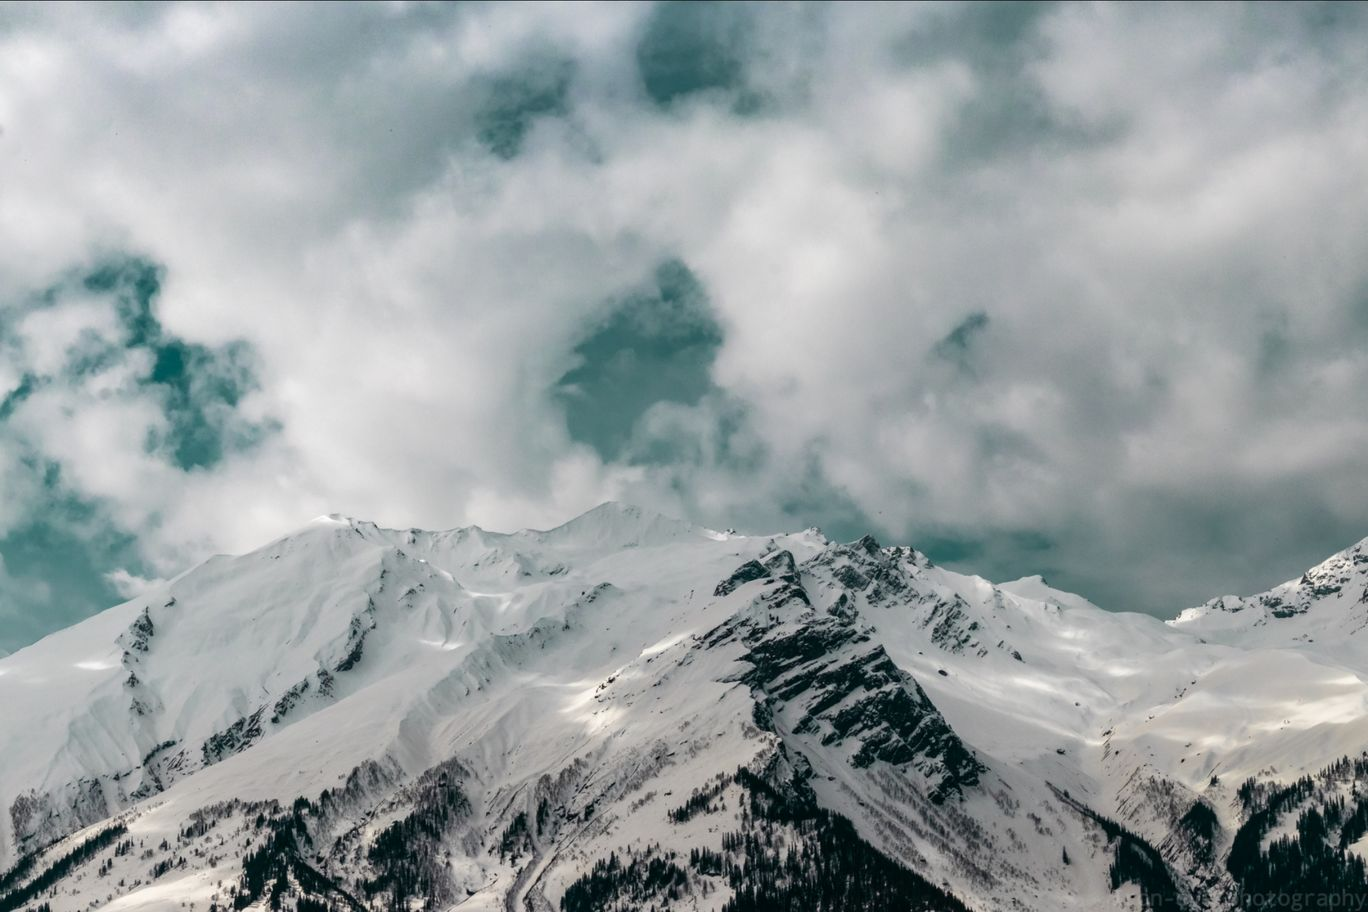 Photo of Himachal Pradesh By Vikas Shrivastav